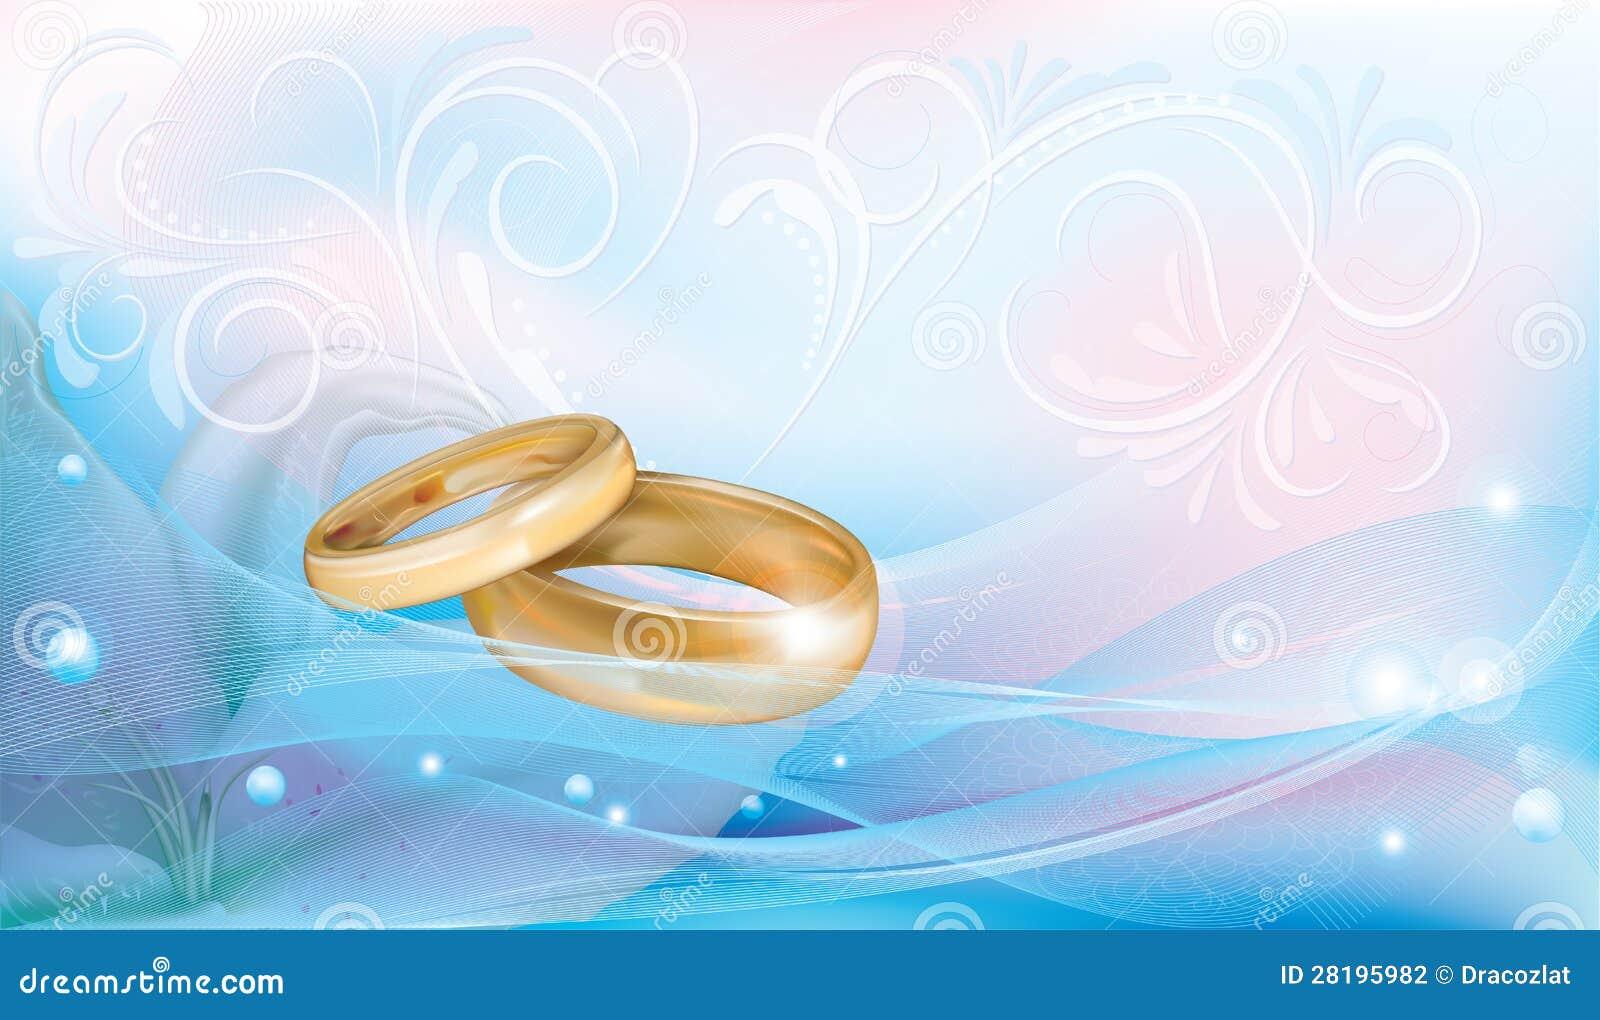 Wedding Rings Stock Photography Image 28195982